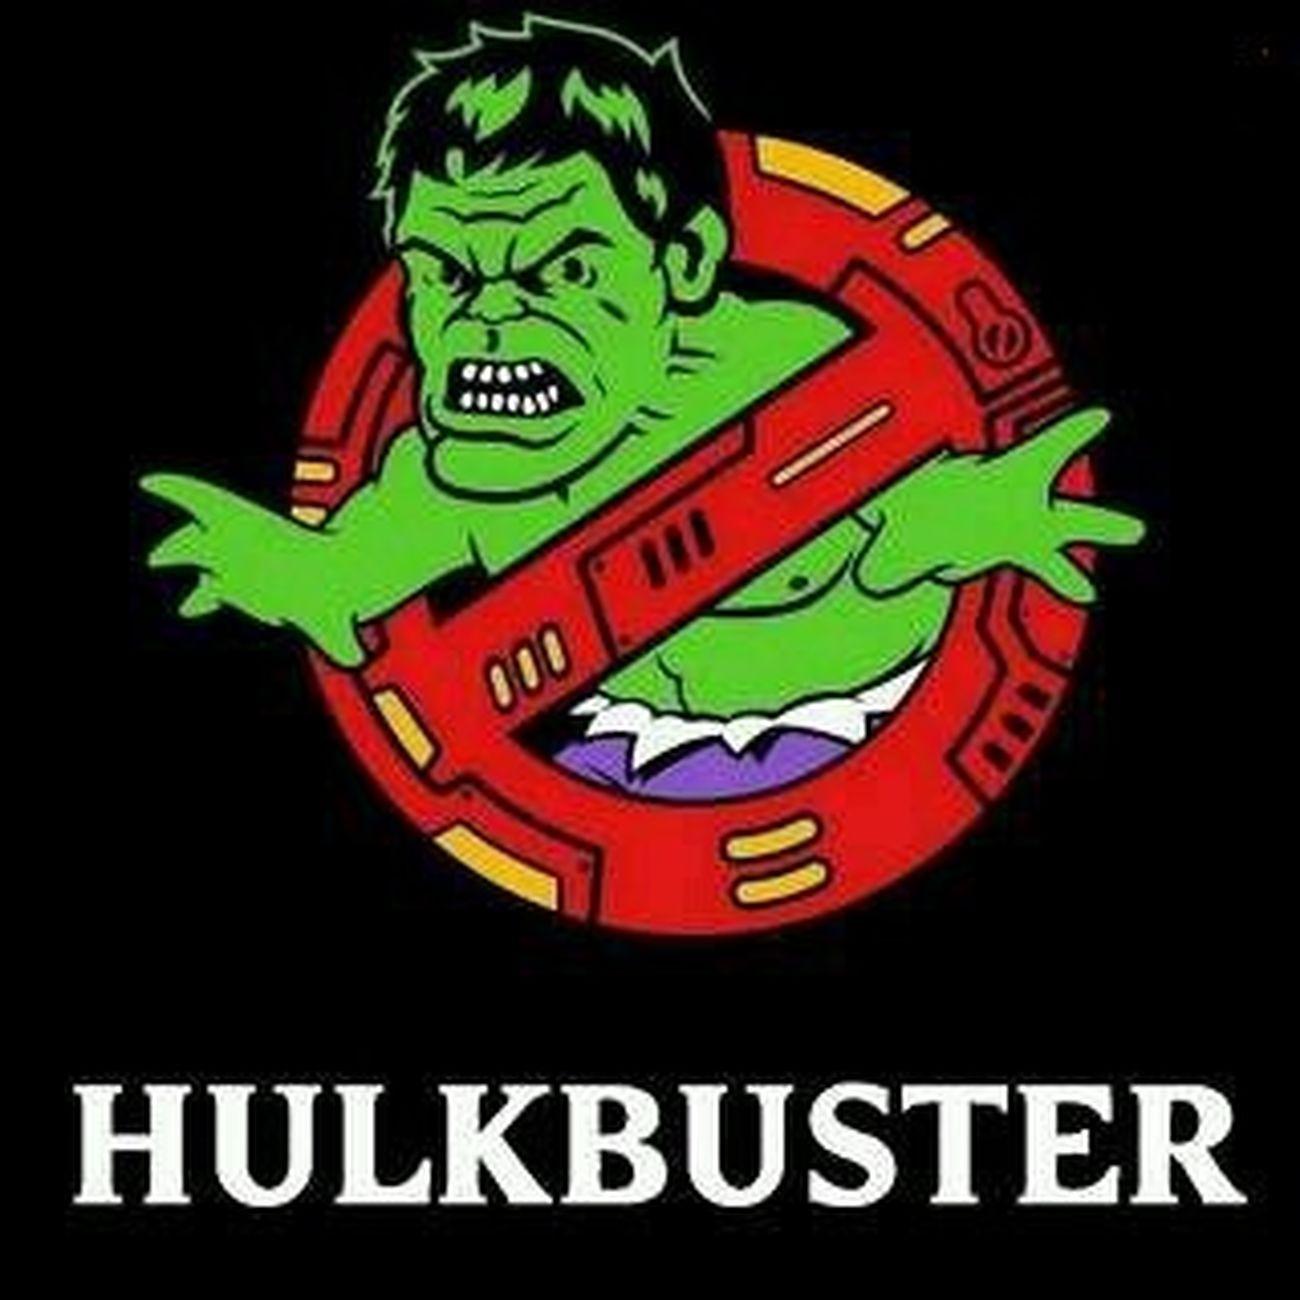 Oincrivelhulk Hulkbuster Theincrediblehulk Avengers vingadores marvelcomics filmes